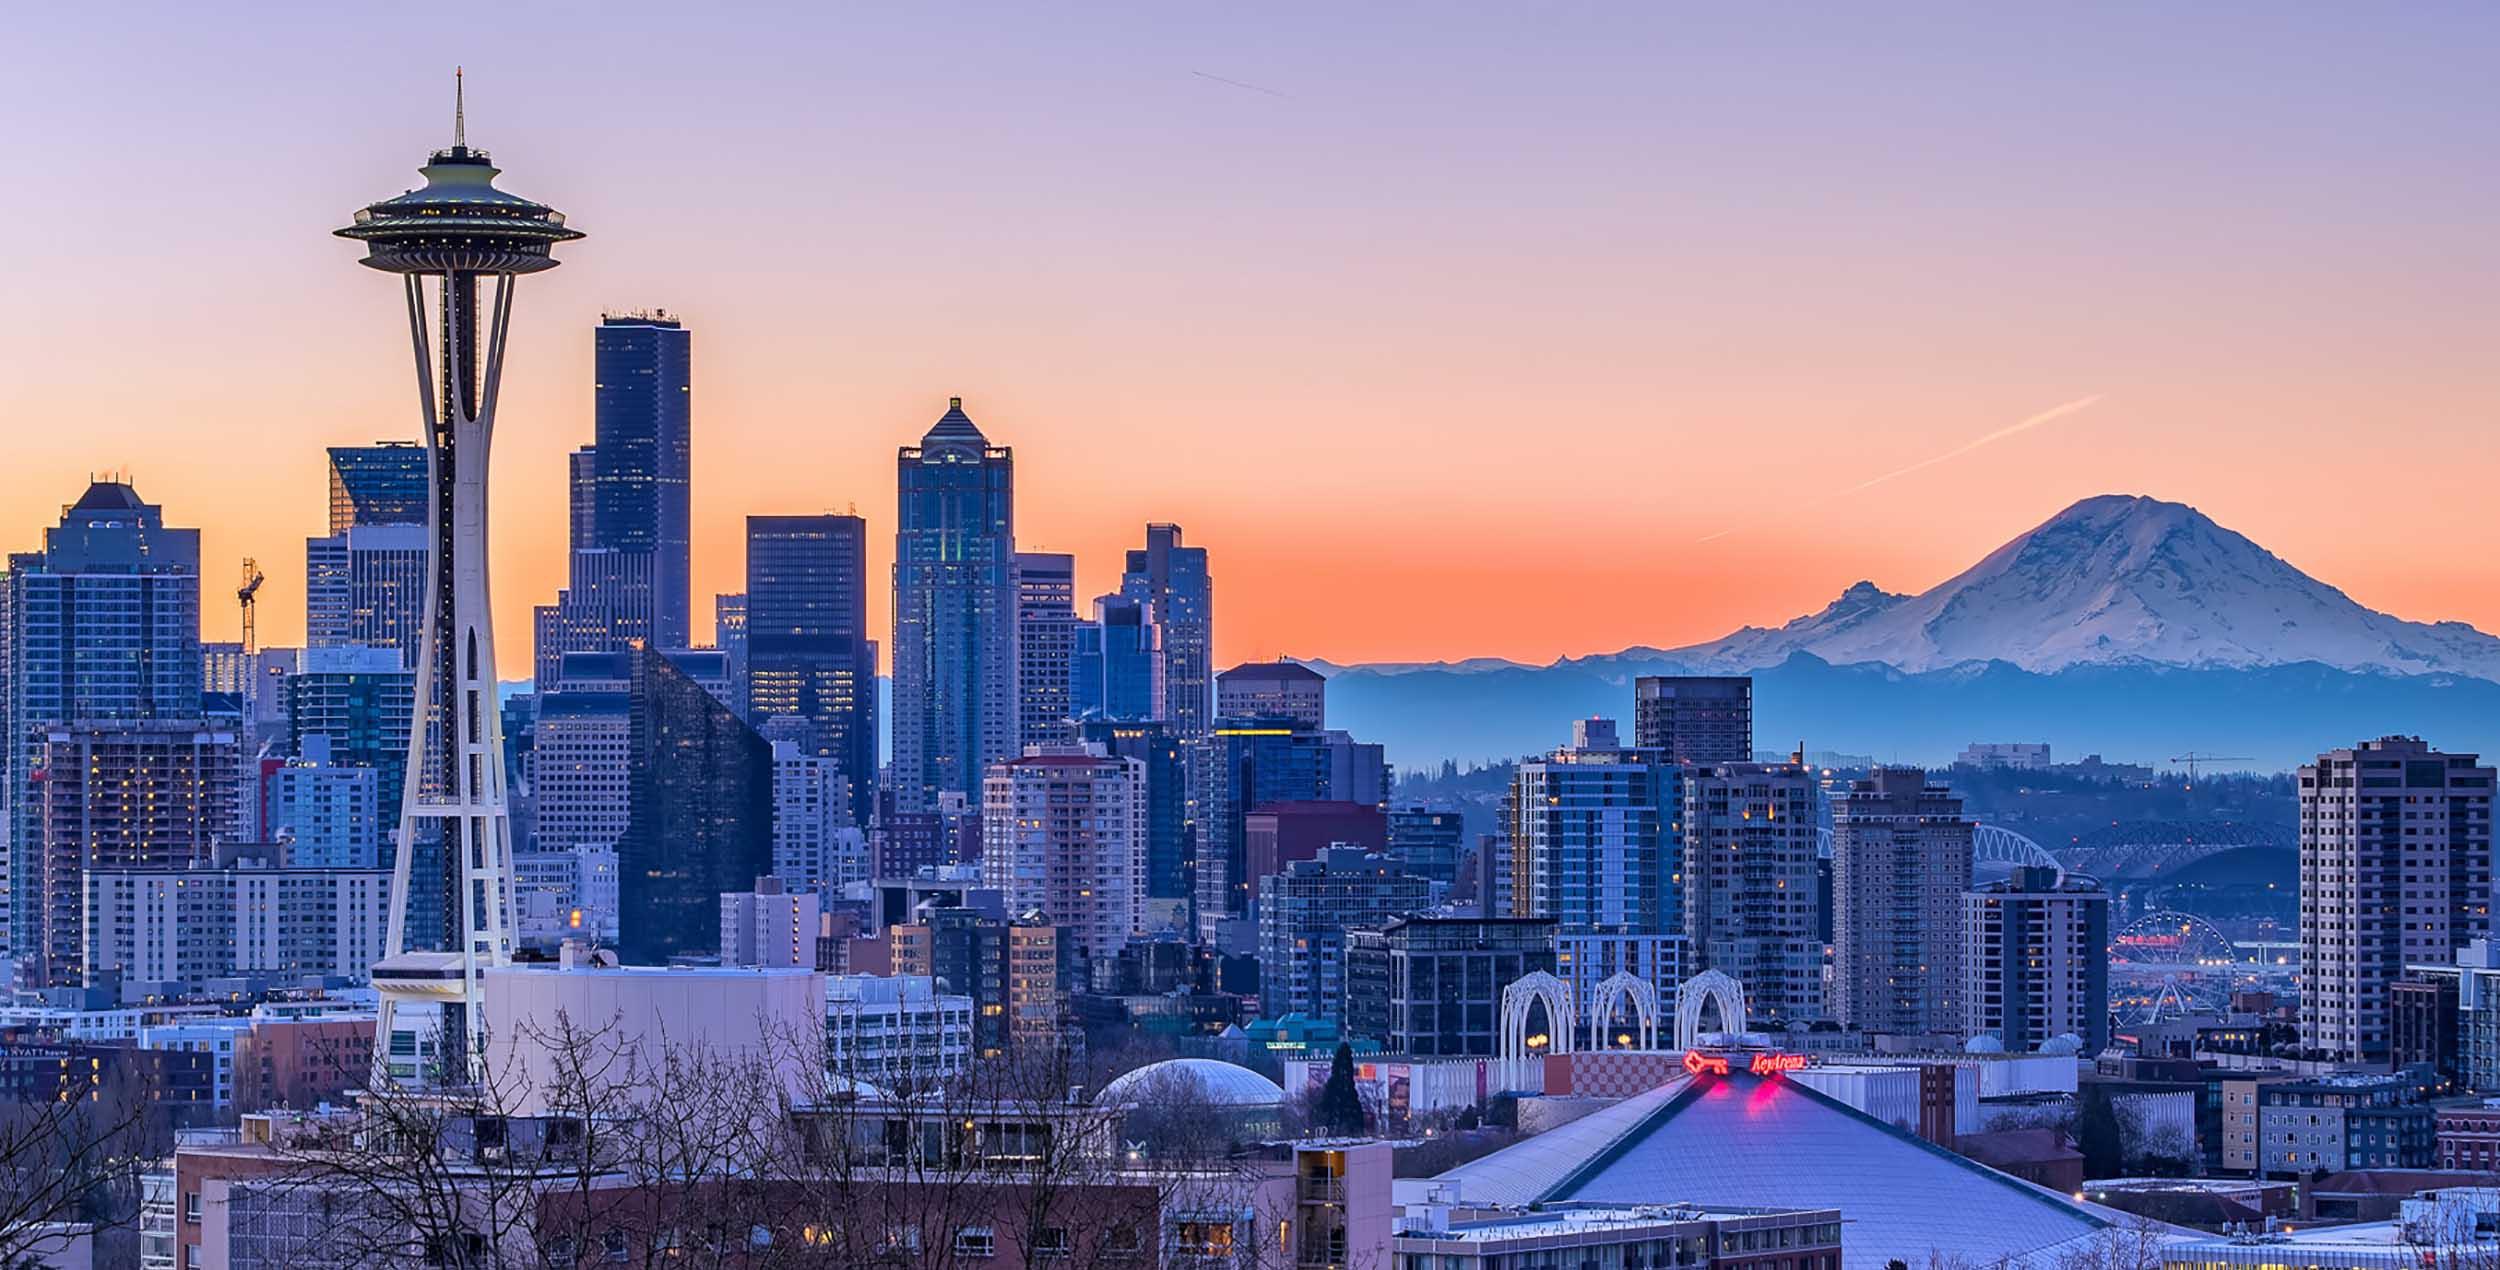 7-Seattle-Washington.jpg